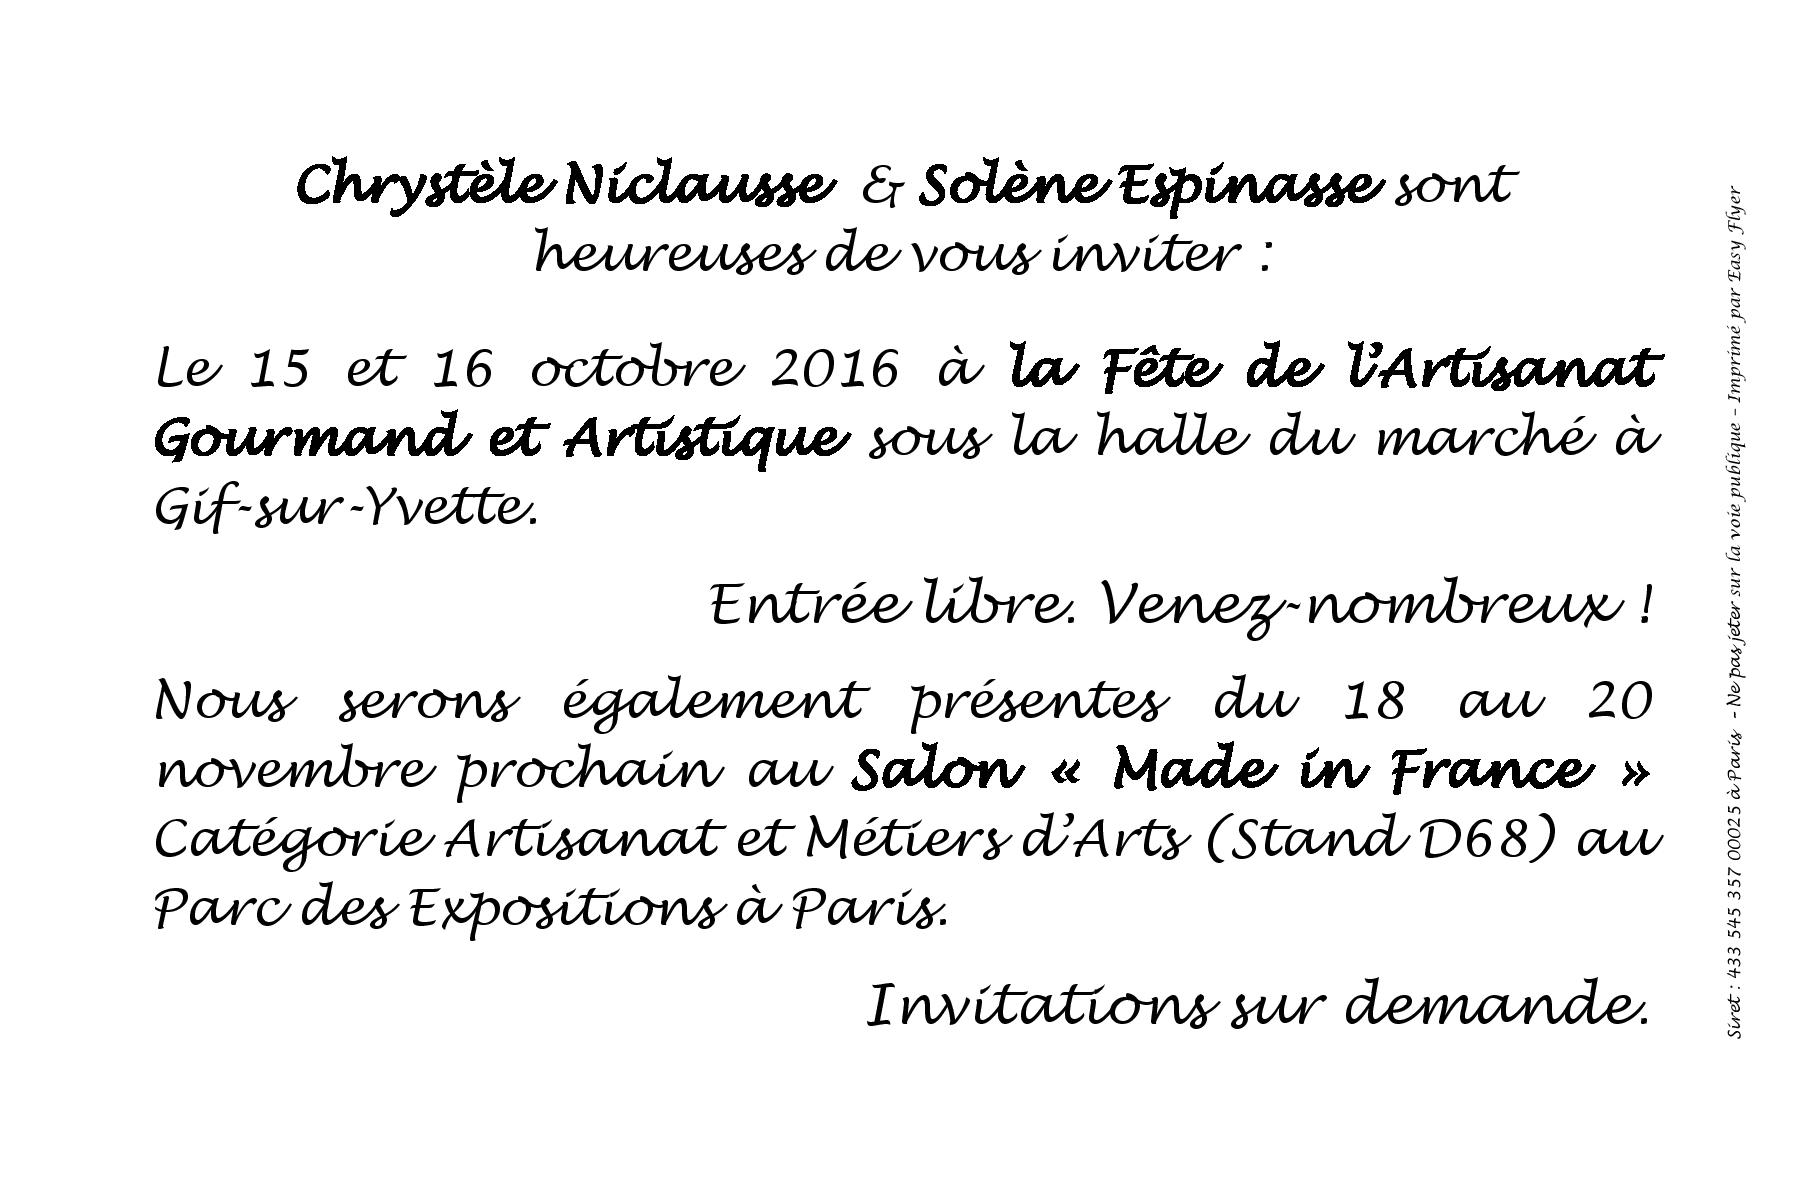 F te artisanat gourmand et artistique 91 for Mif expo le salon du made in france 10 novembre